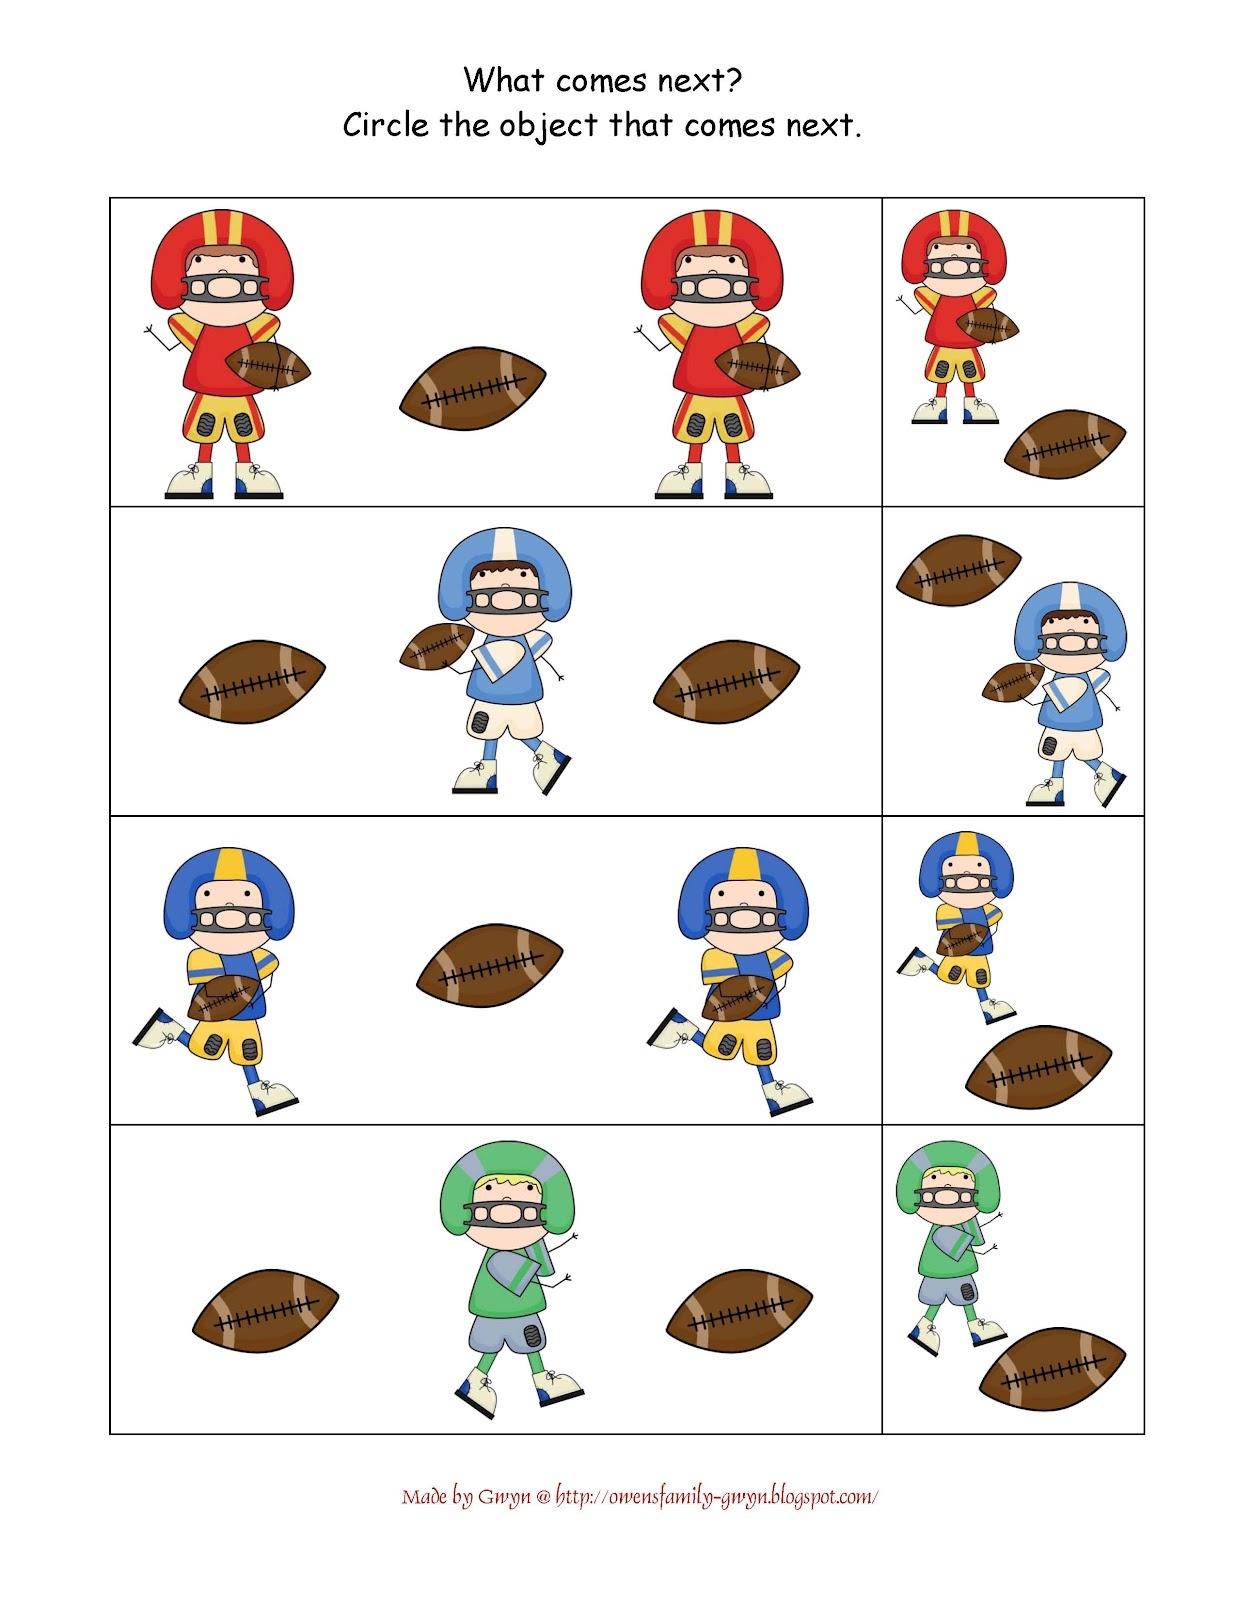 Football What Comes Next 1 236 1 600 Pixels